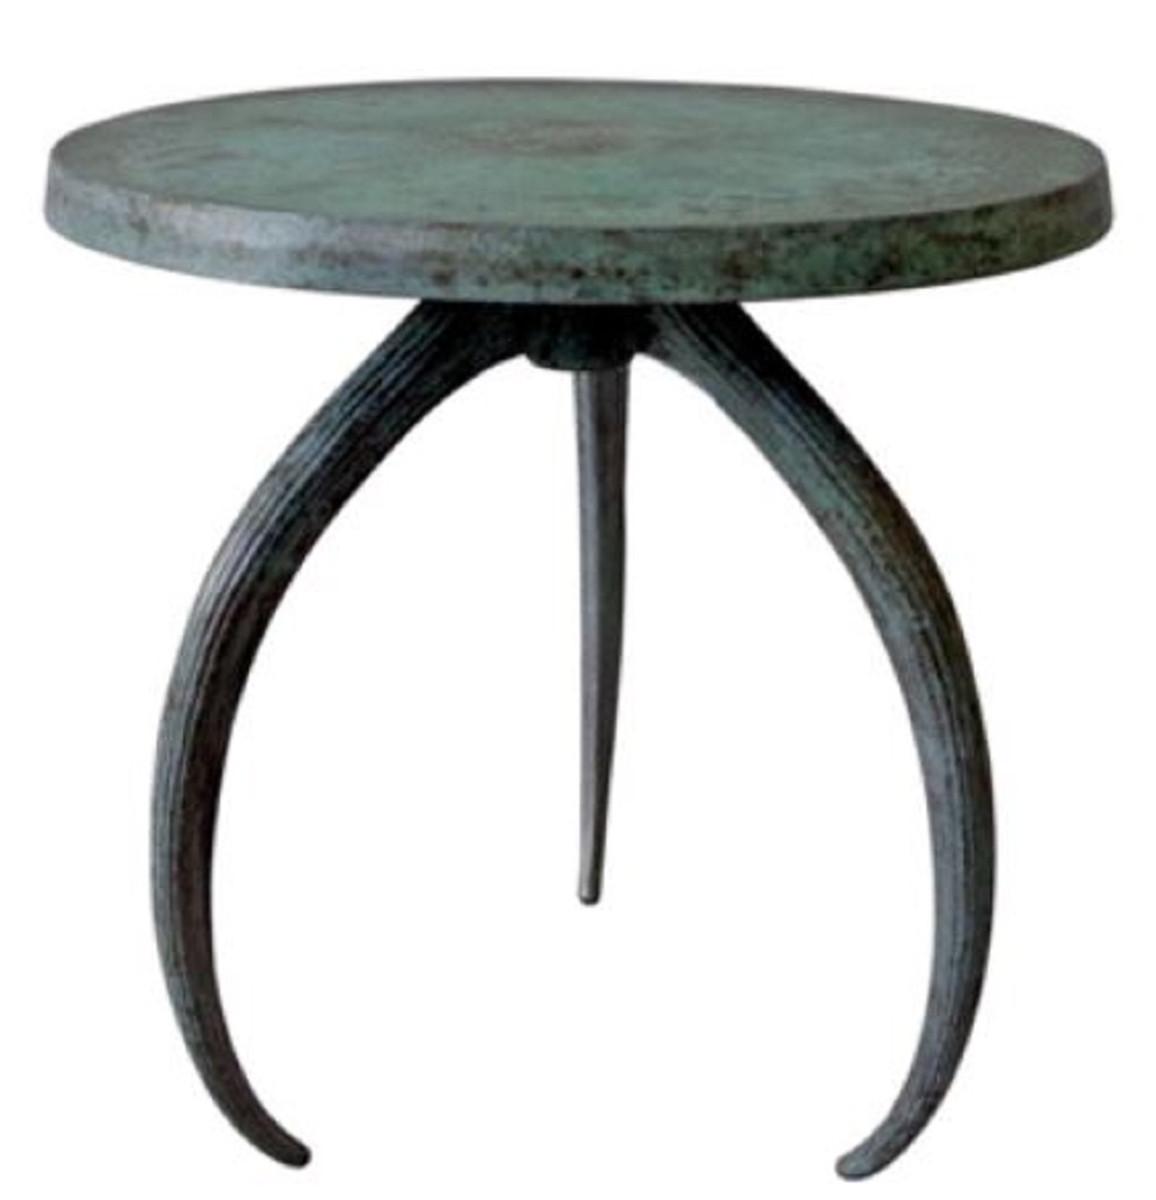 Casa Padrino Designer Beistelltisch Grau / Antik Grün Ø 48 x H. 54 cm - Runder Aluminium Tisch - Aluminium Möbel 1